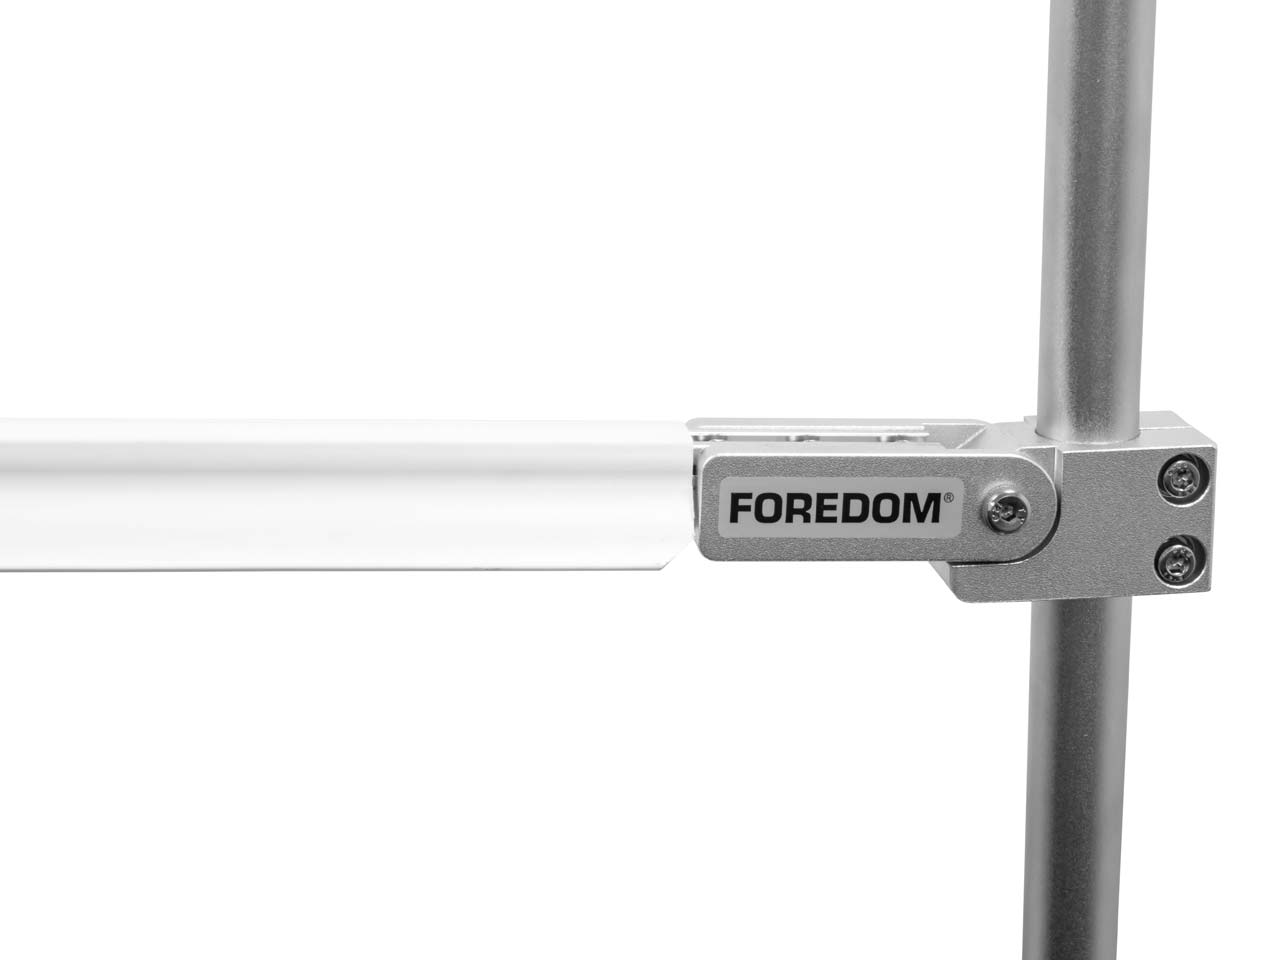 Genuine-US-Foredom-Workbench-Accessories-System miniatura 25